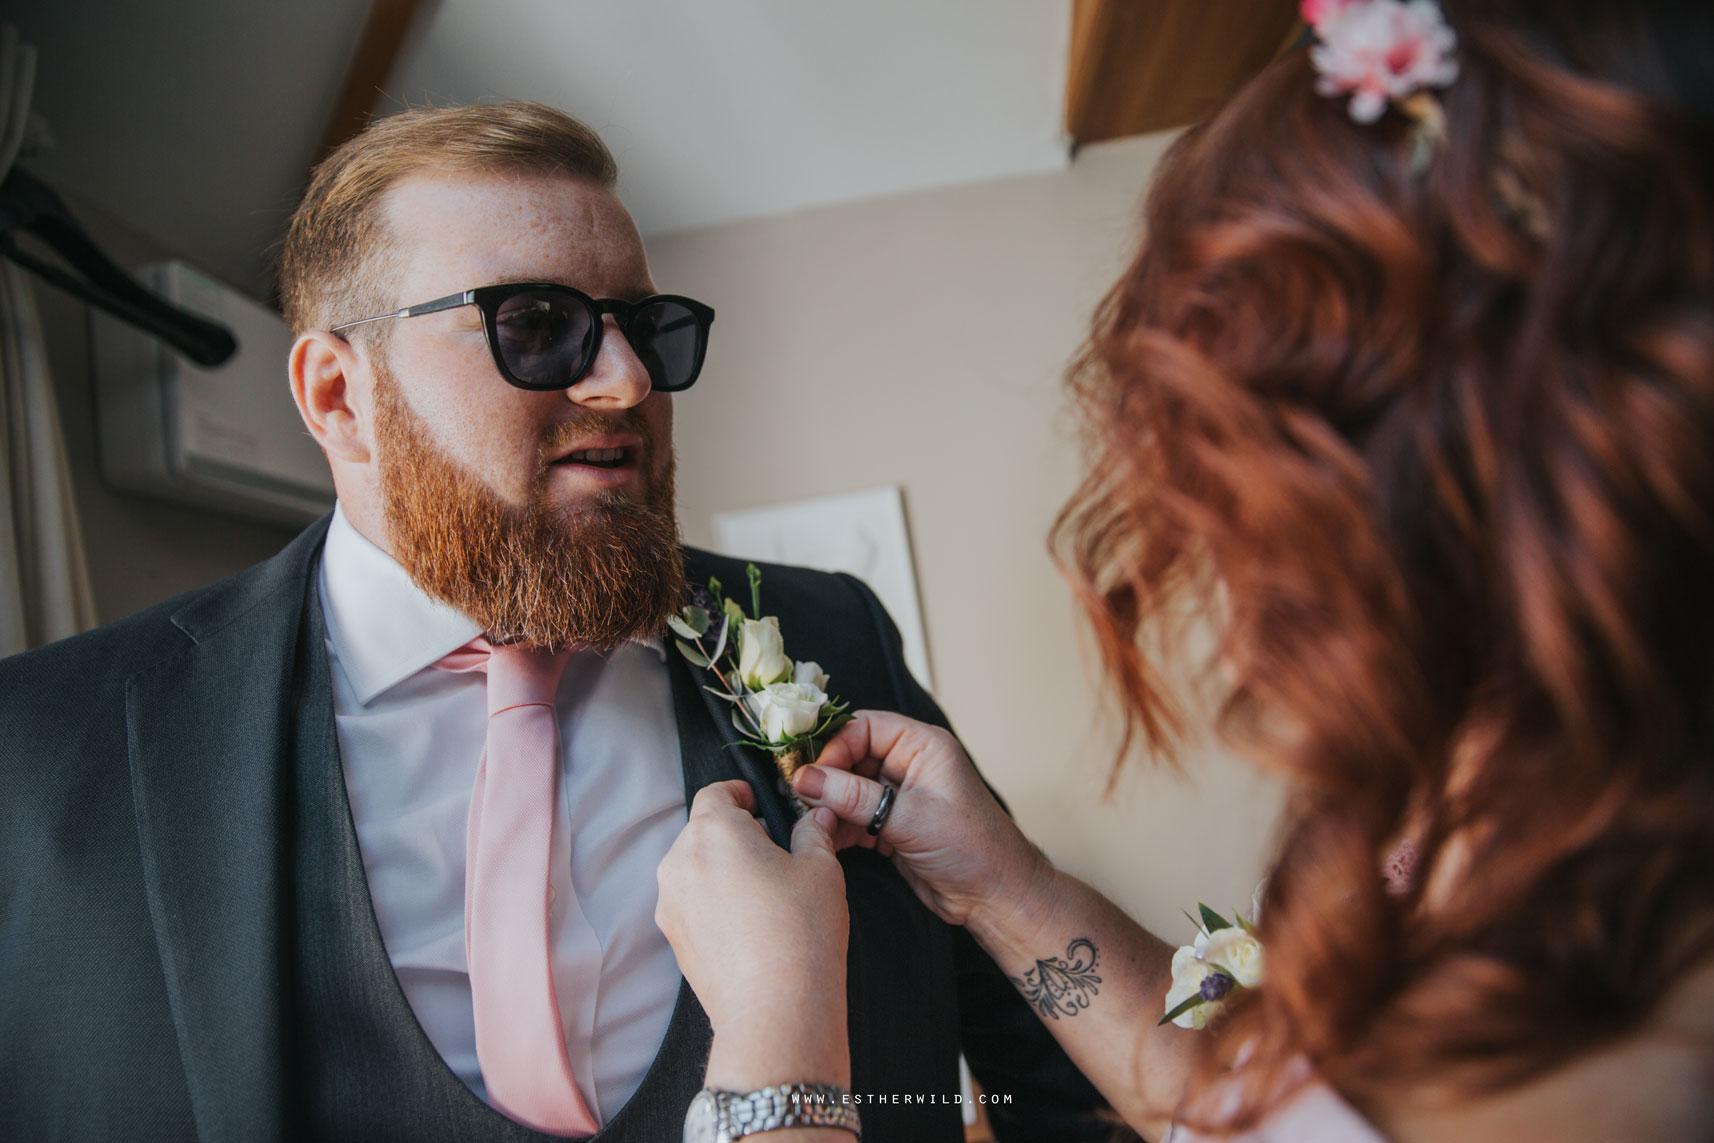 Cromer_Wedding_Beach_Outdoor_Ceremony_Norfolk_North_Lodge_Registry_Office_Rocket_House_Cafe_Cromer_Pier_IMG_3420_IMGL7633.jpg